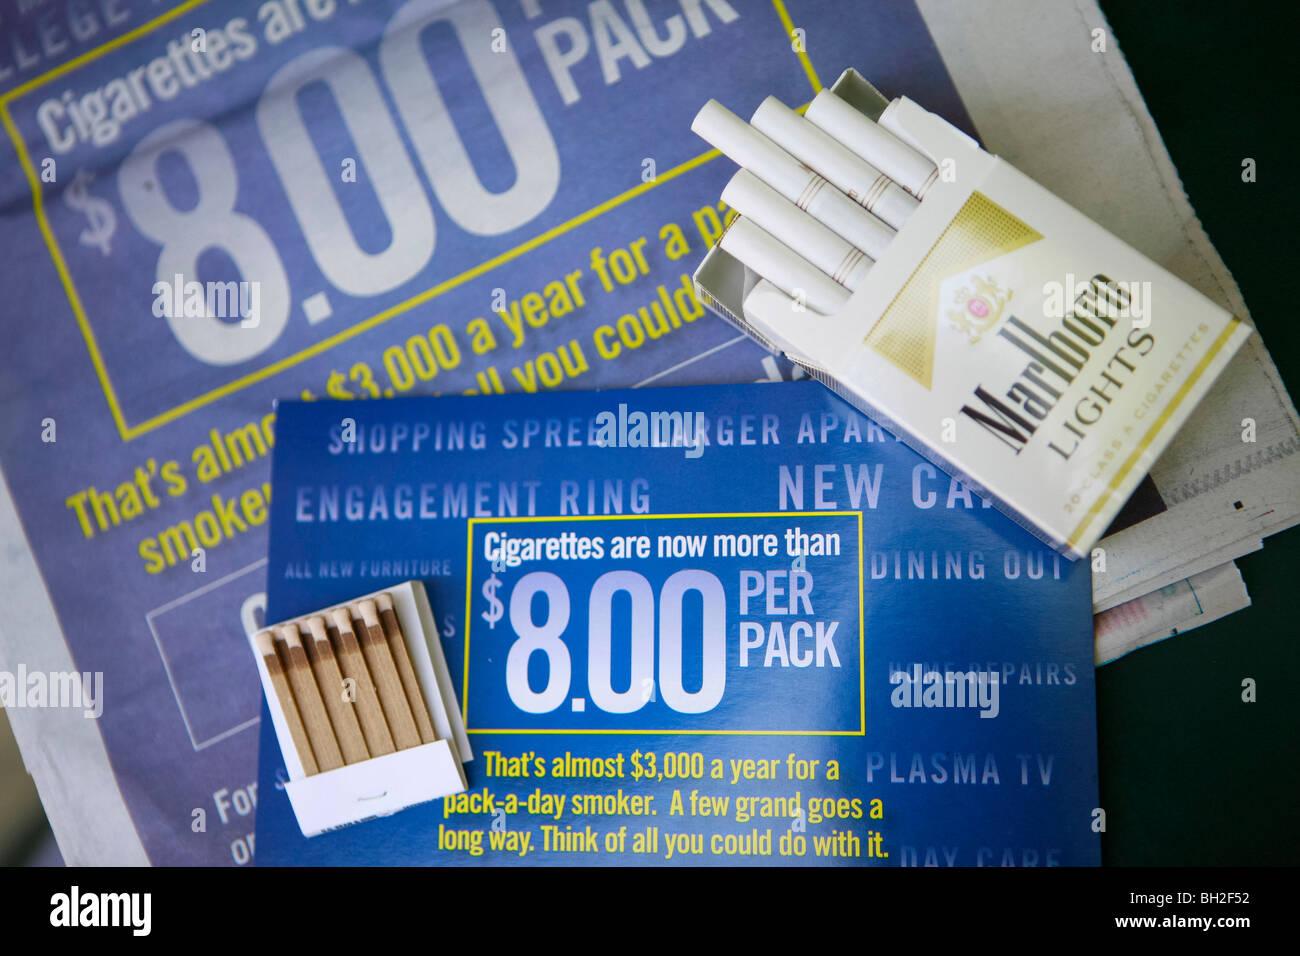 Marlboro cigarette and book of matches - Stock Image